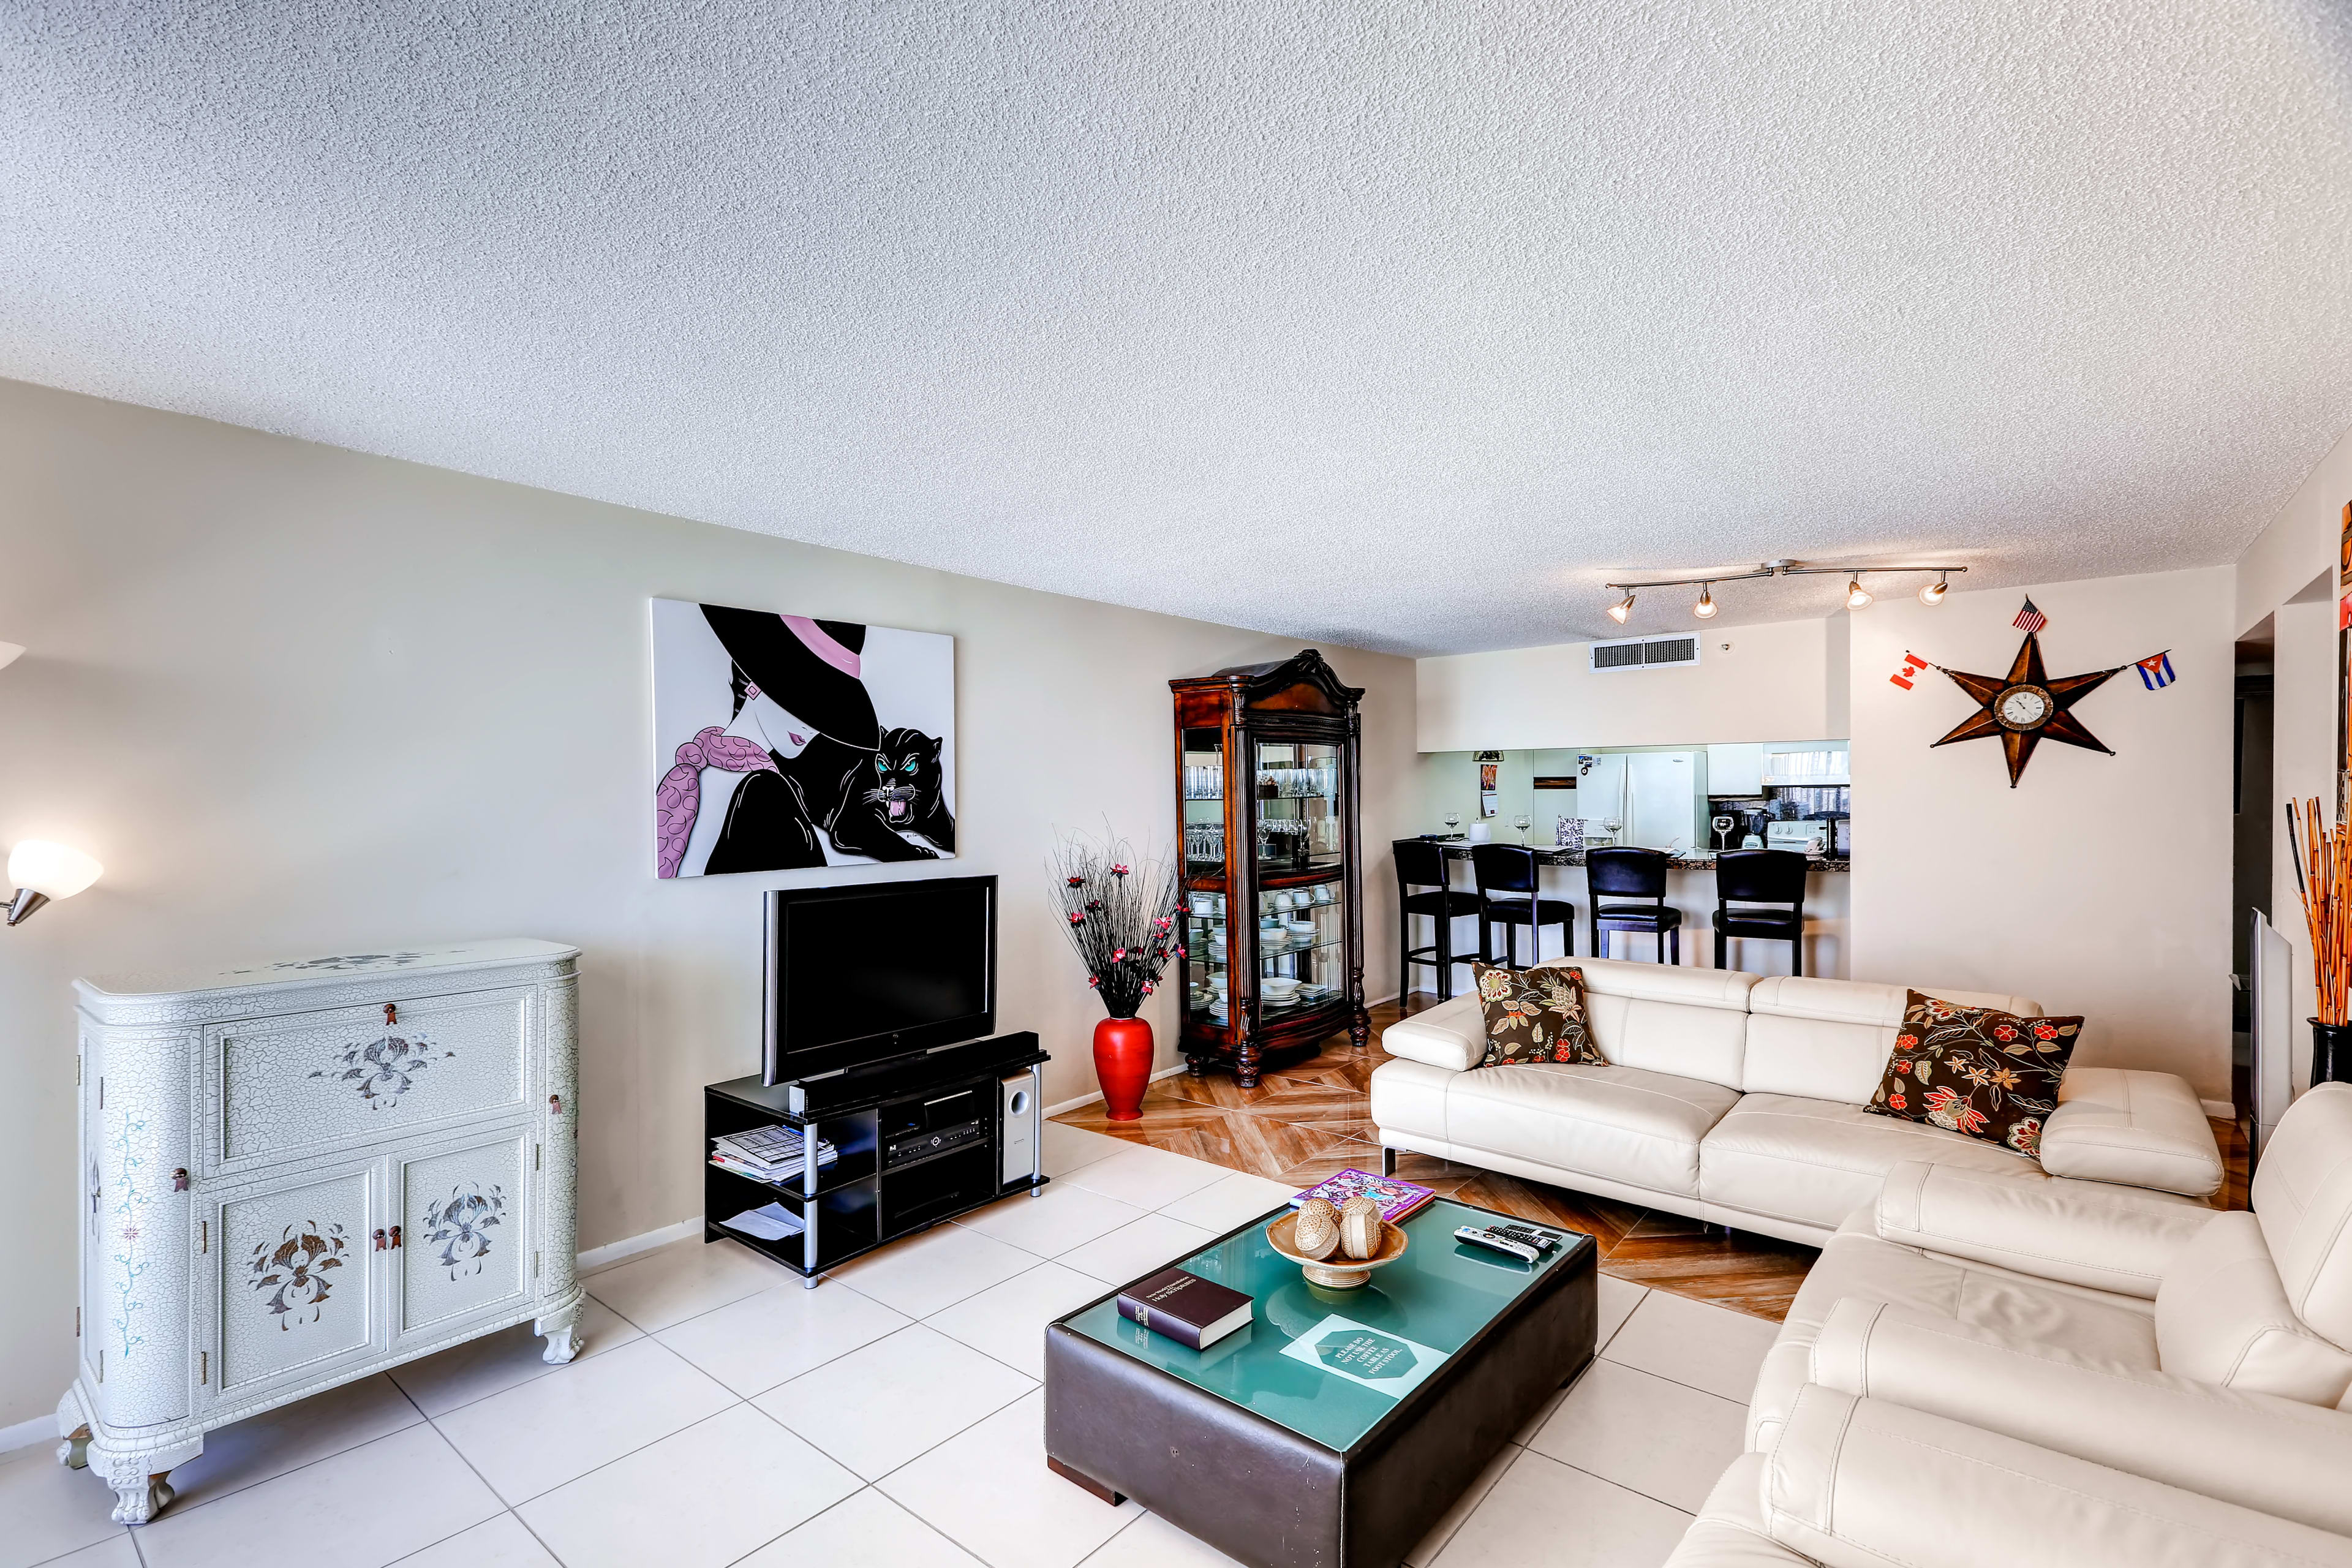 Enjoy resort-style luxury at this condo!